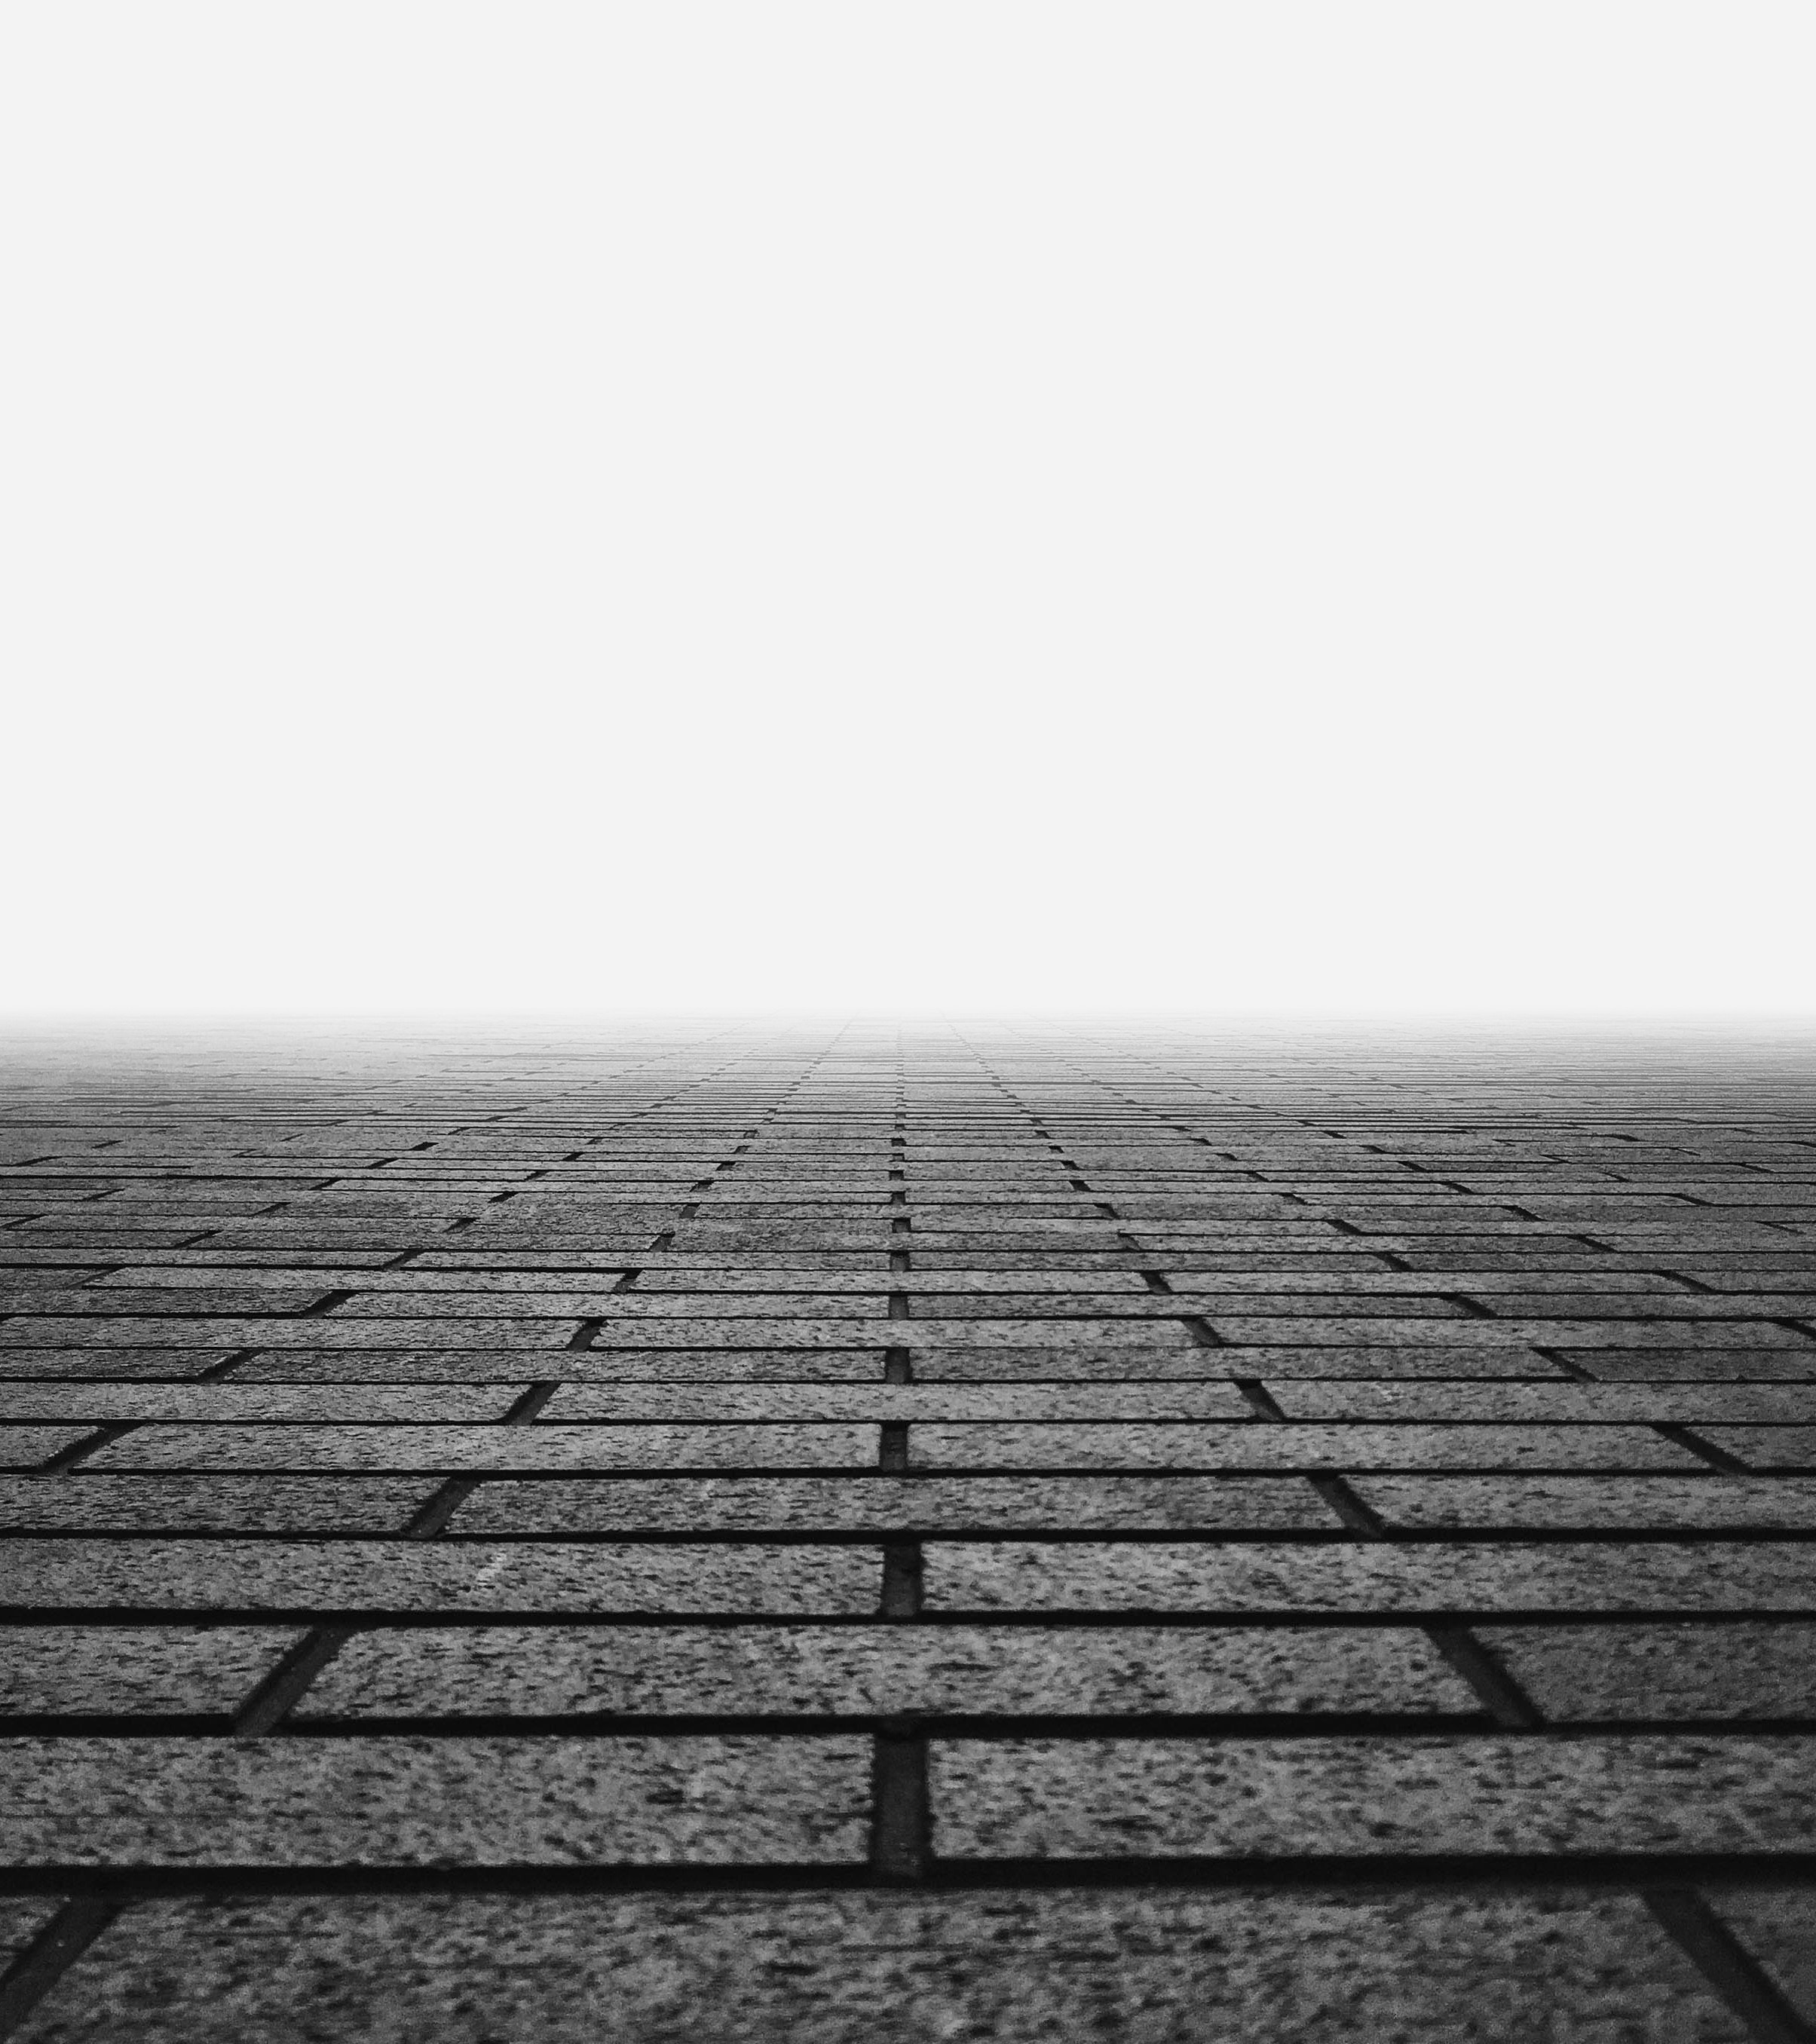 crushingthewall-overcomingobstacles-challenges.jpg